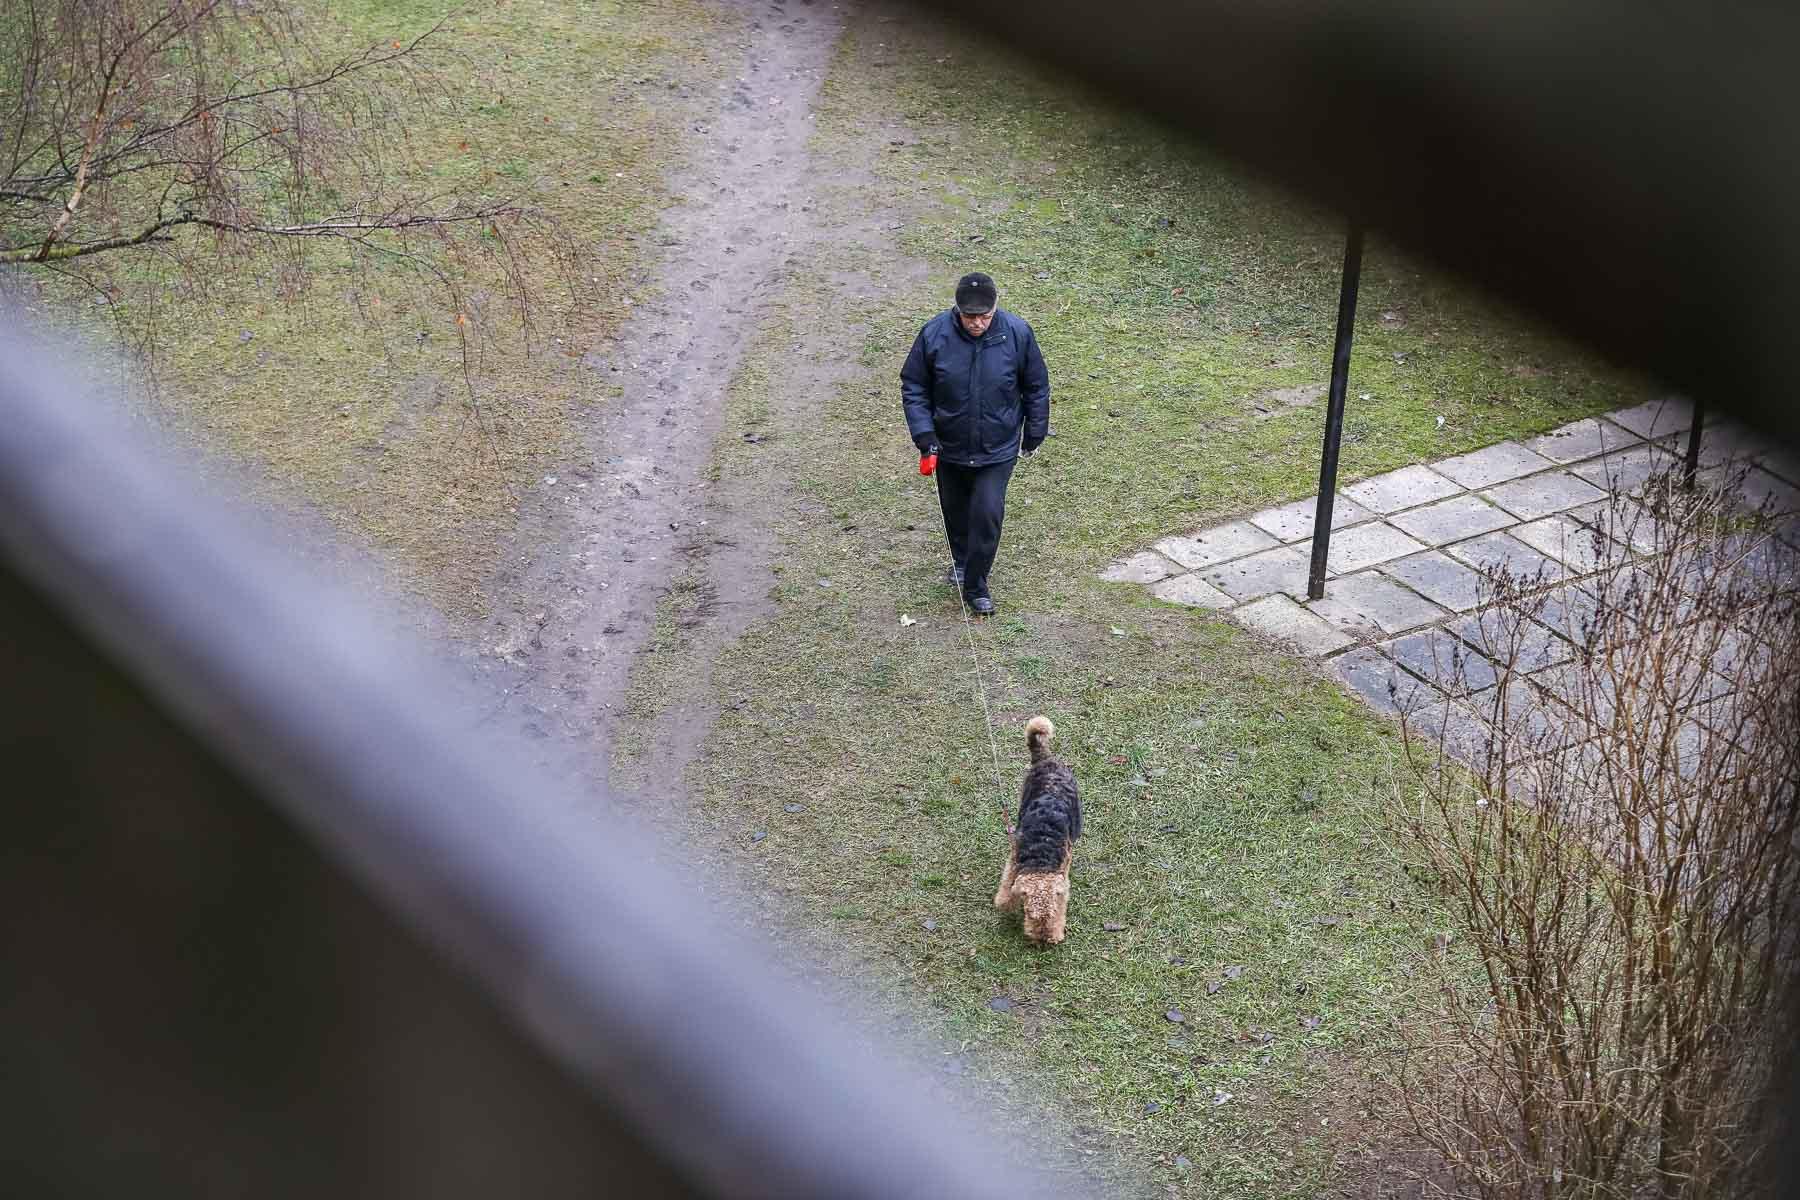 Landscape-cityscape-photography-jelgava-latvia-blocs-blocks-flat-post-soviet--Советские-квартиры-спальный-район-Латвия-город-фотограф-natalia-smith-photography-0046.jpg